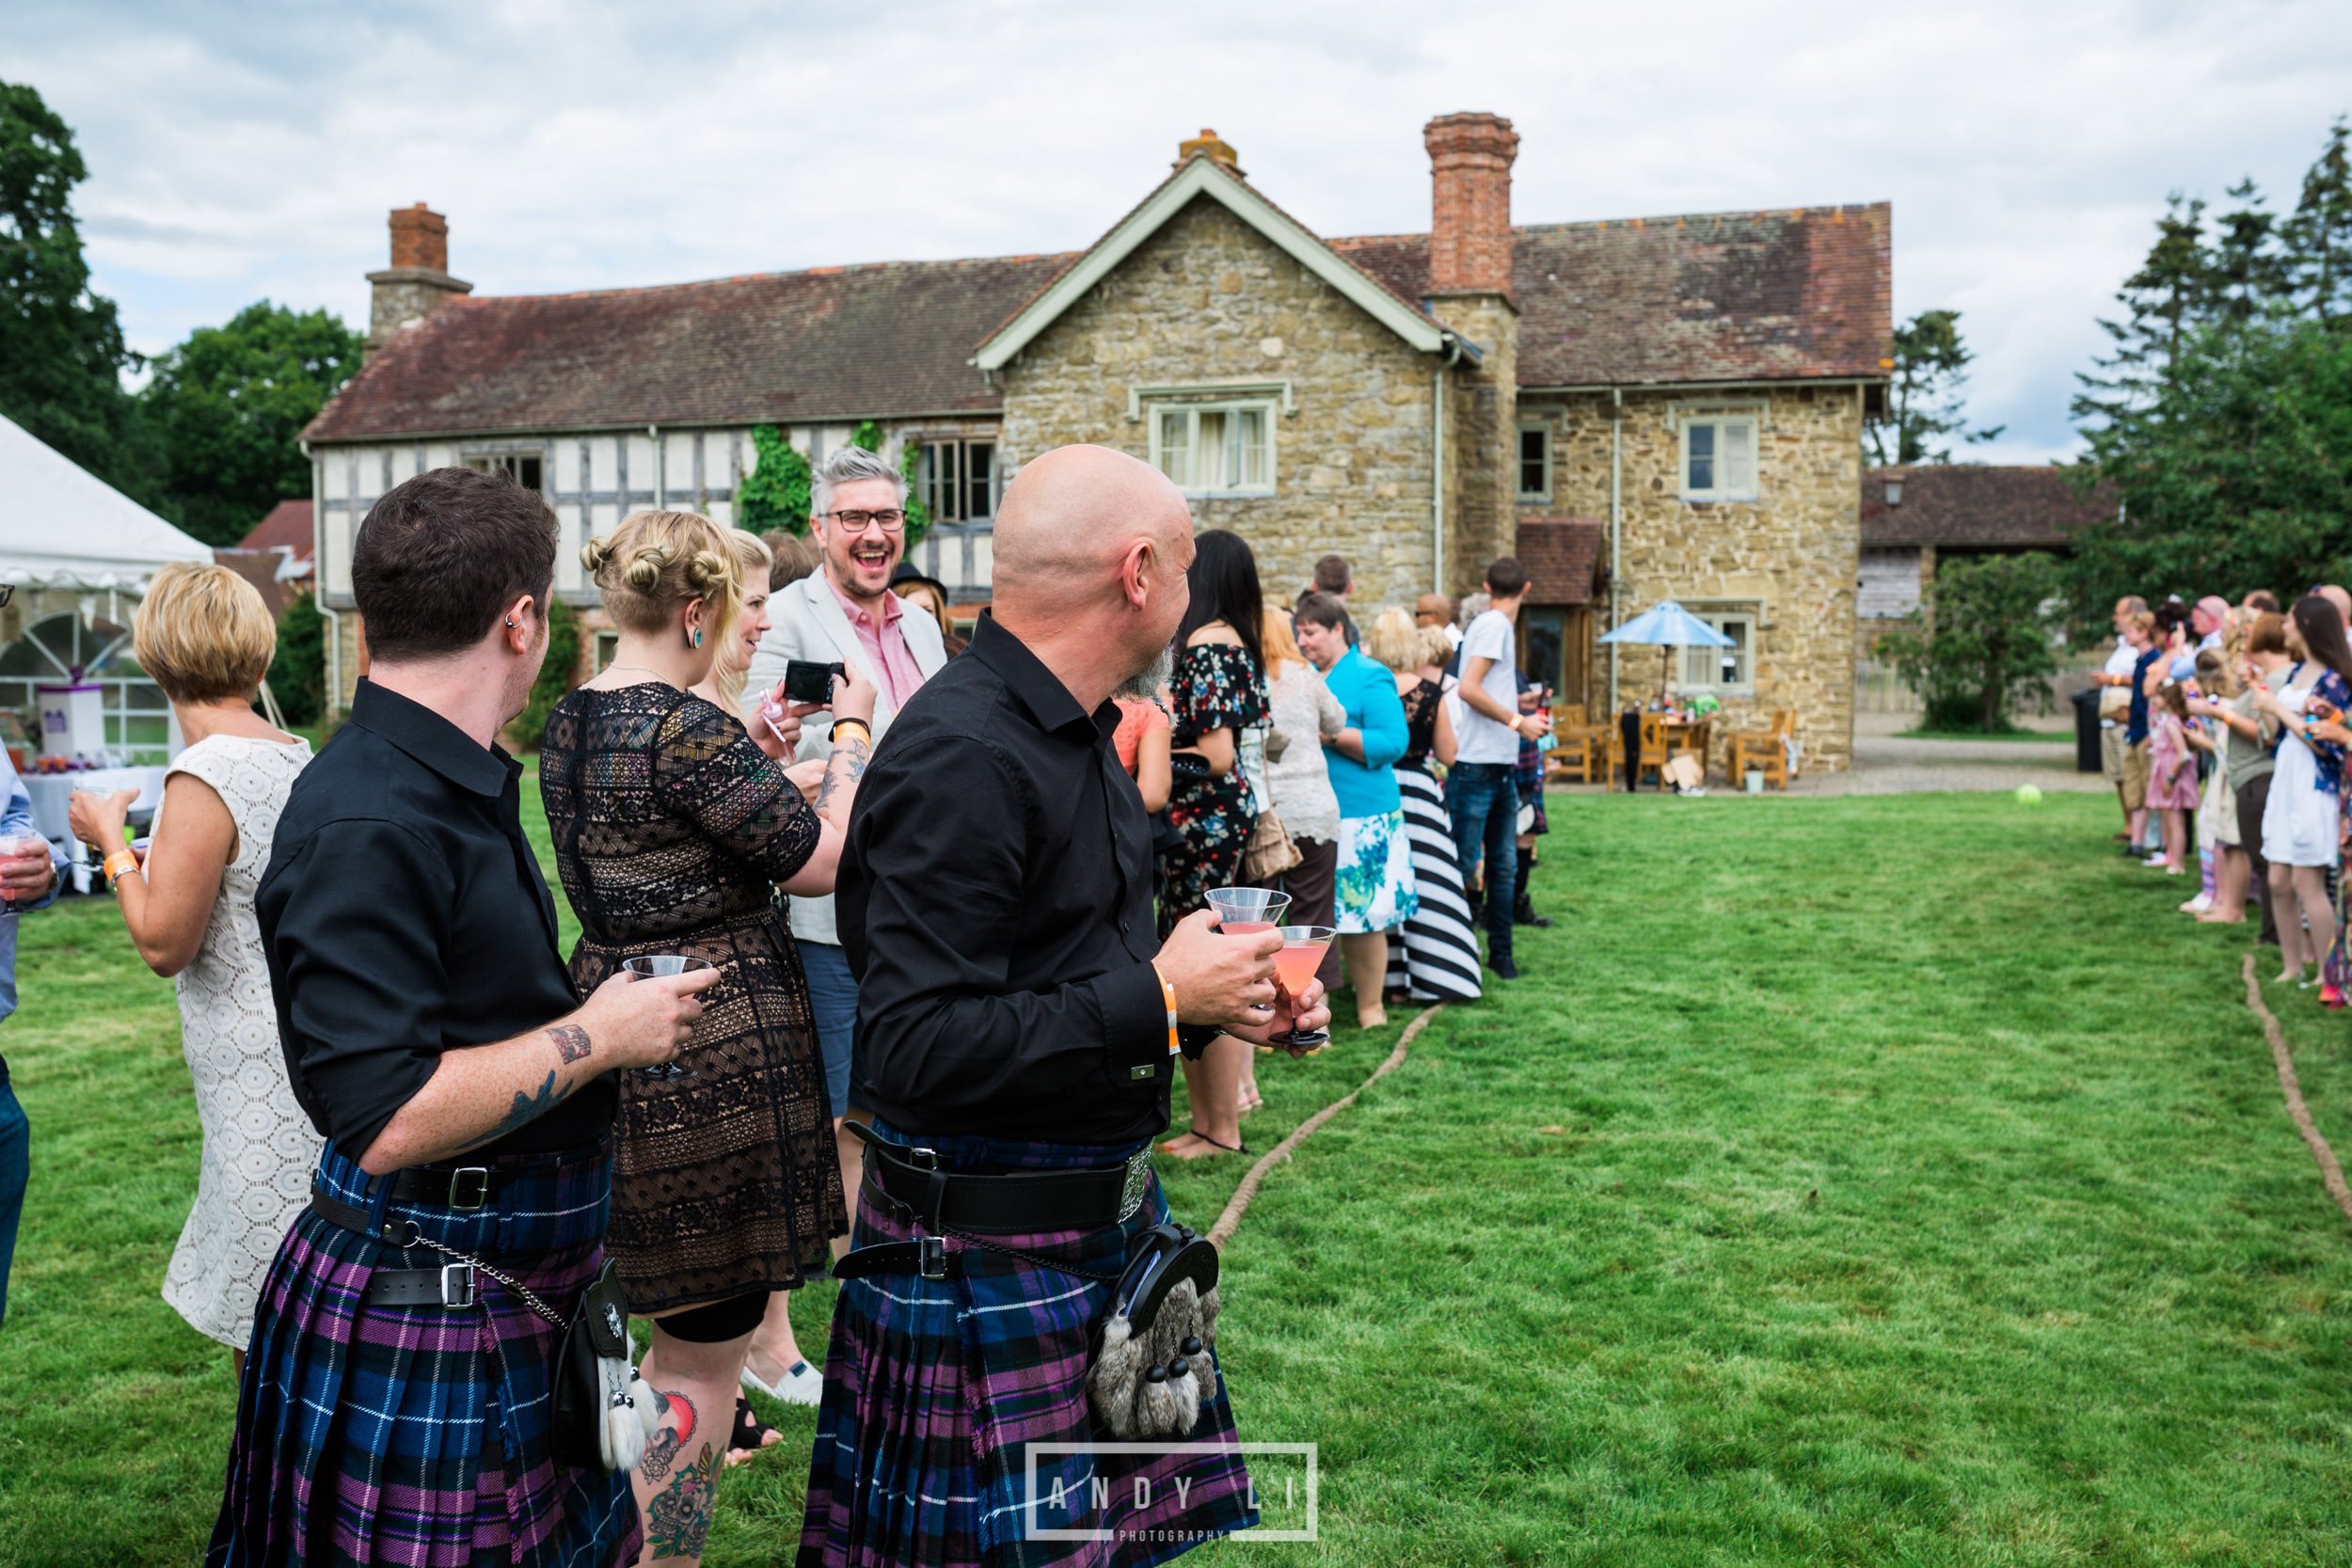 Festival Wedding Shropshire-Andy Li Photography-120.jpg